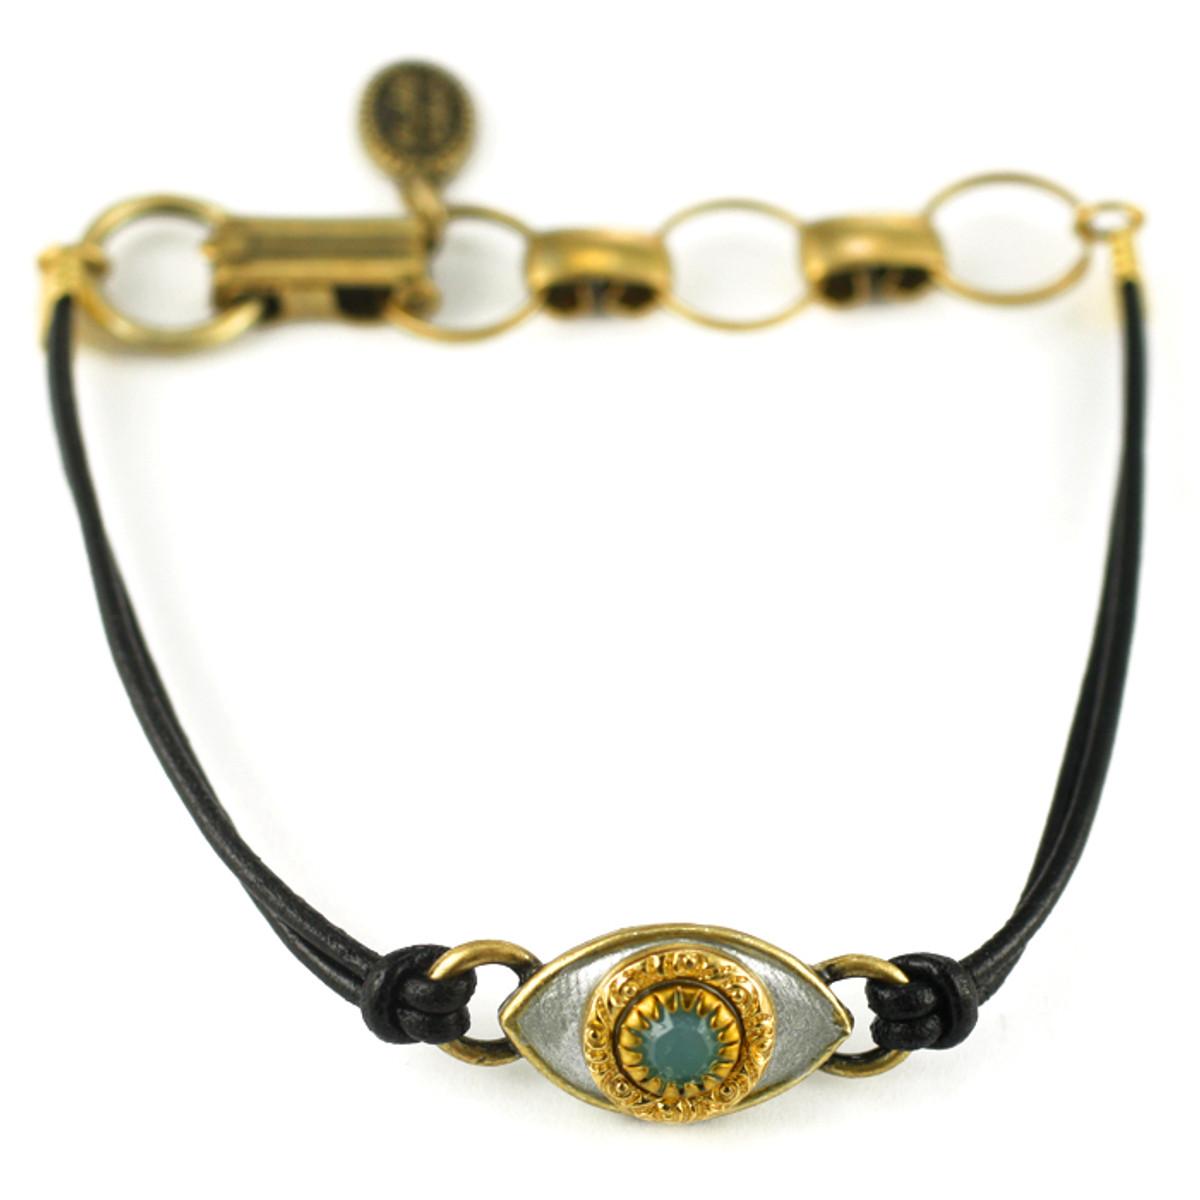 Evil Eye Bracelet- Silver, Medium Eye With Turquoise Crystal Center